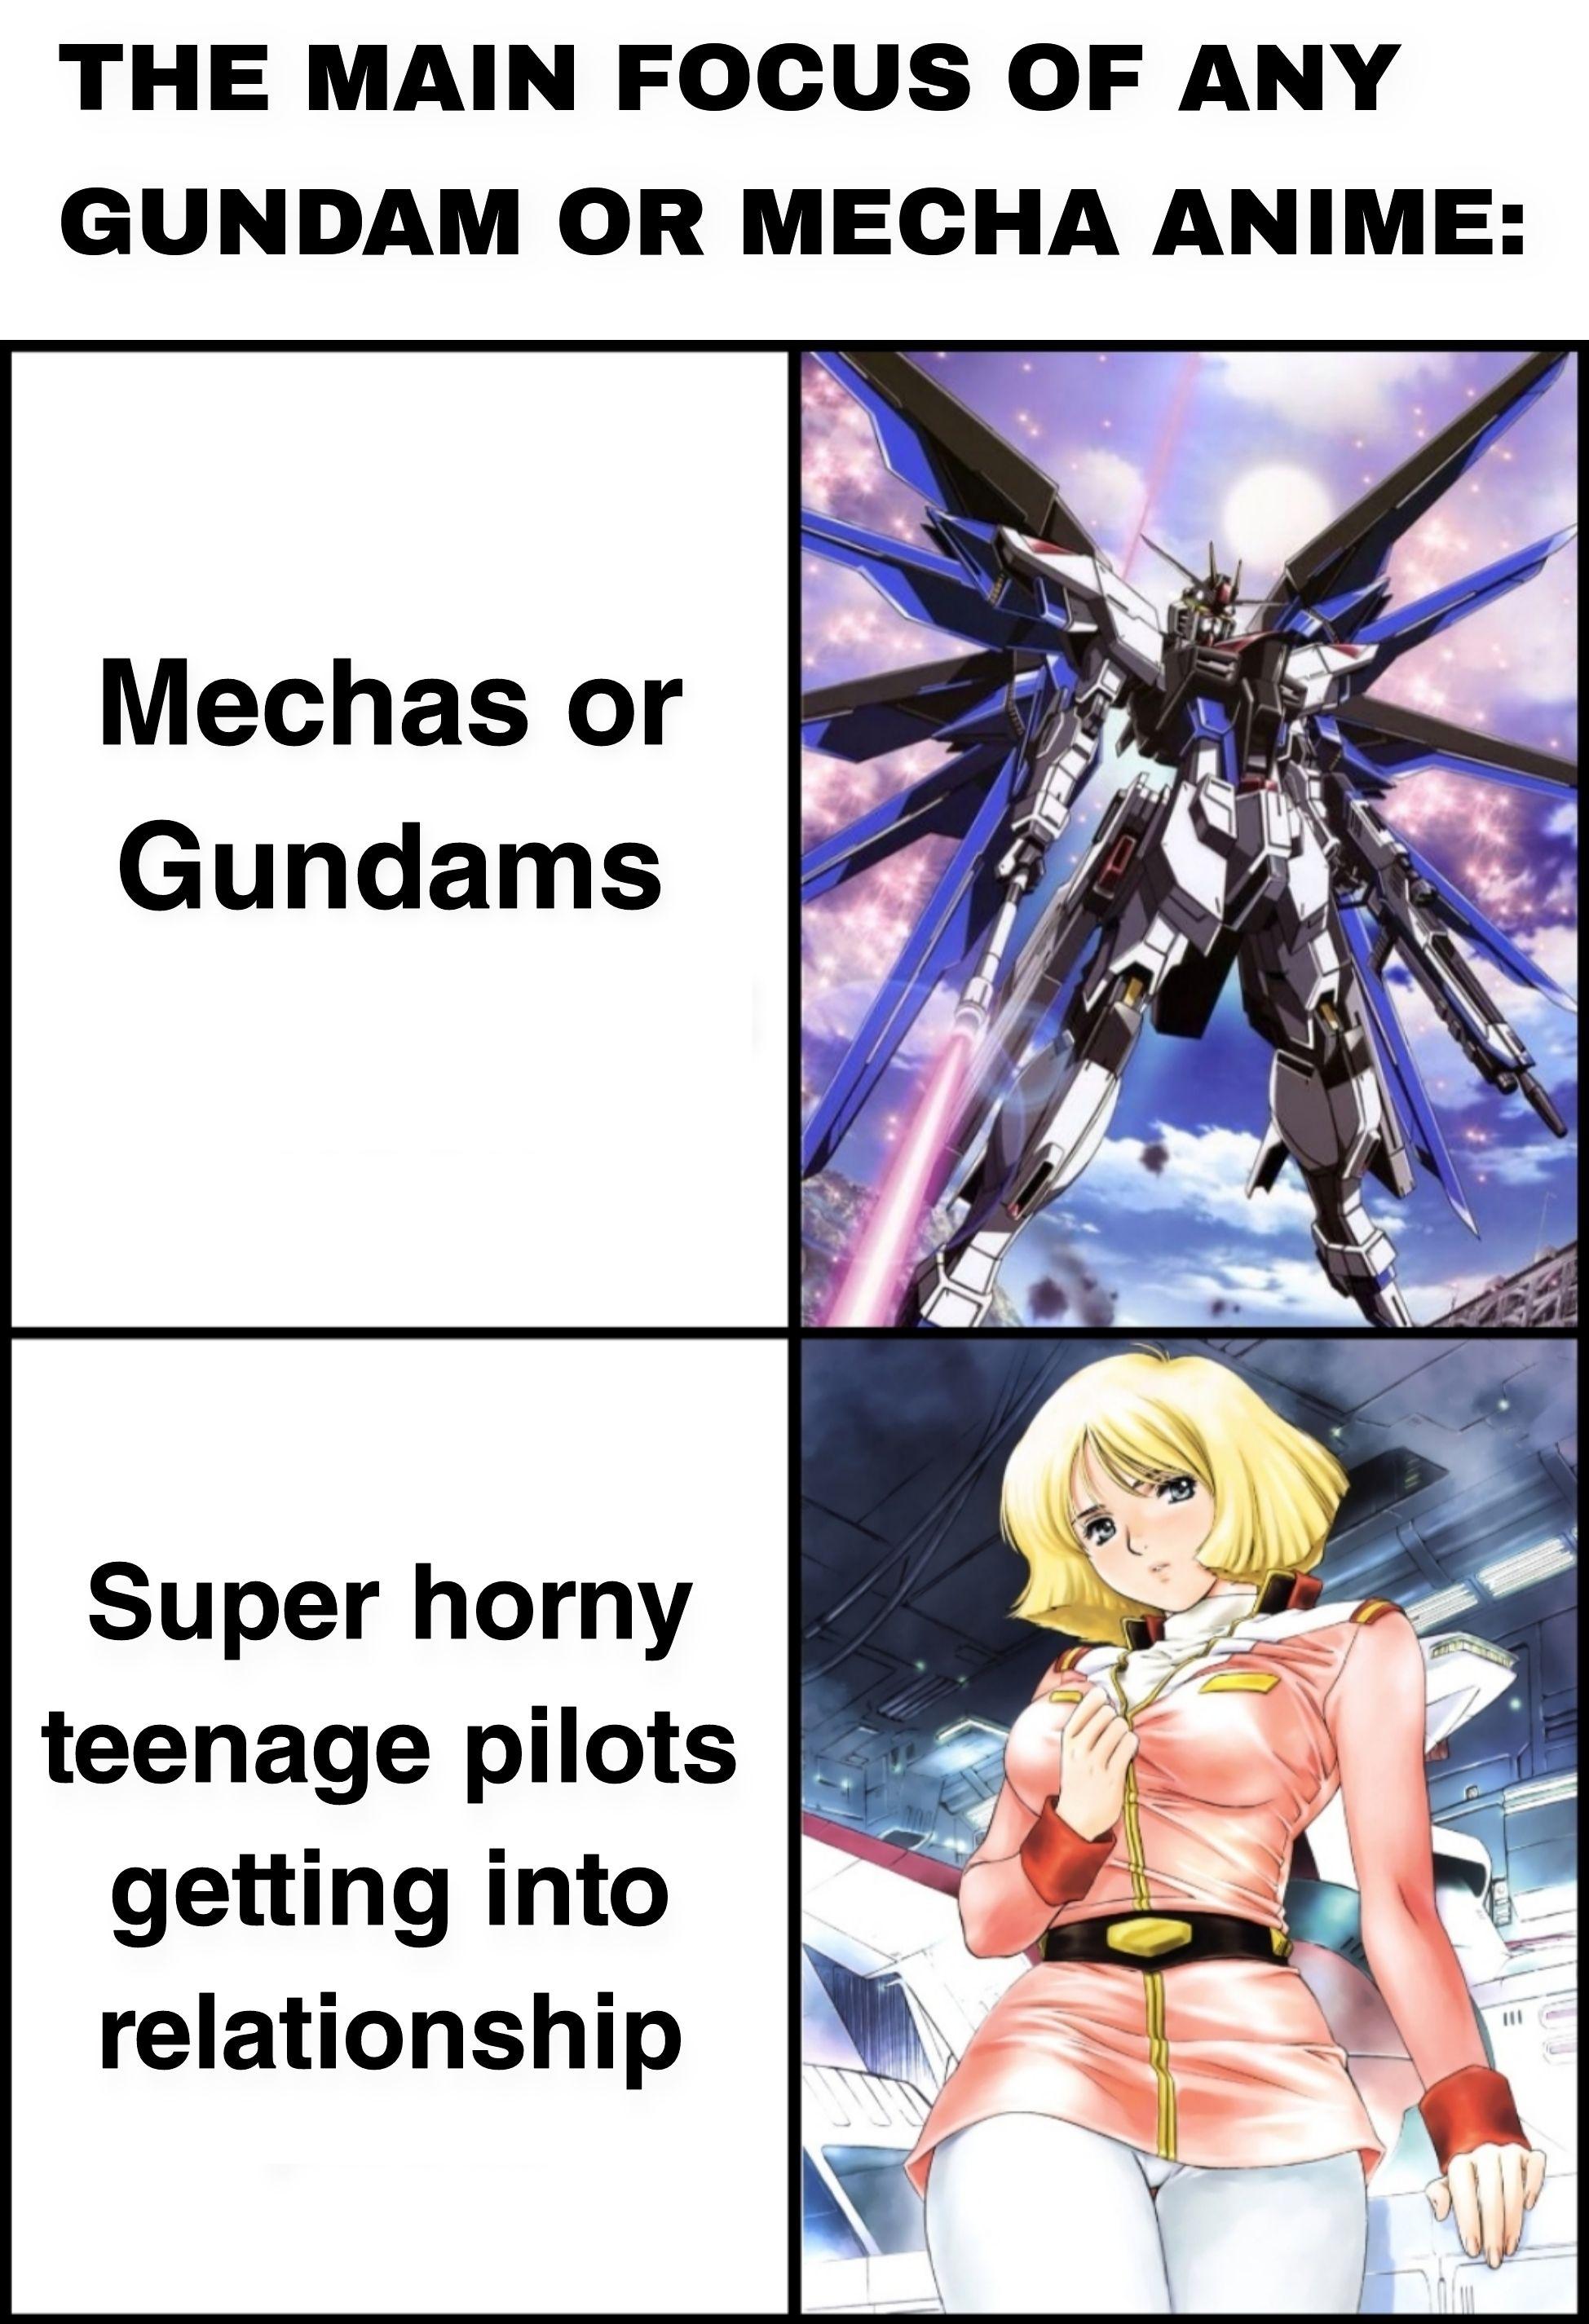 Basically DiTF, Evangelion and Gundam Seed